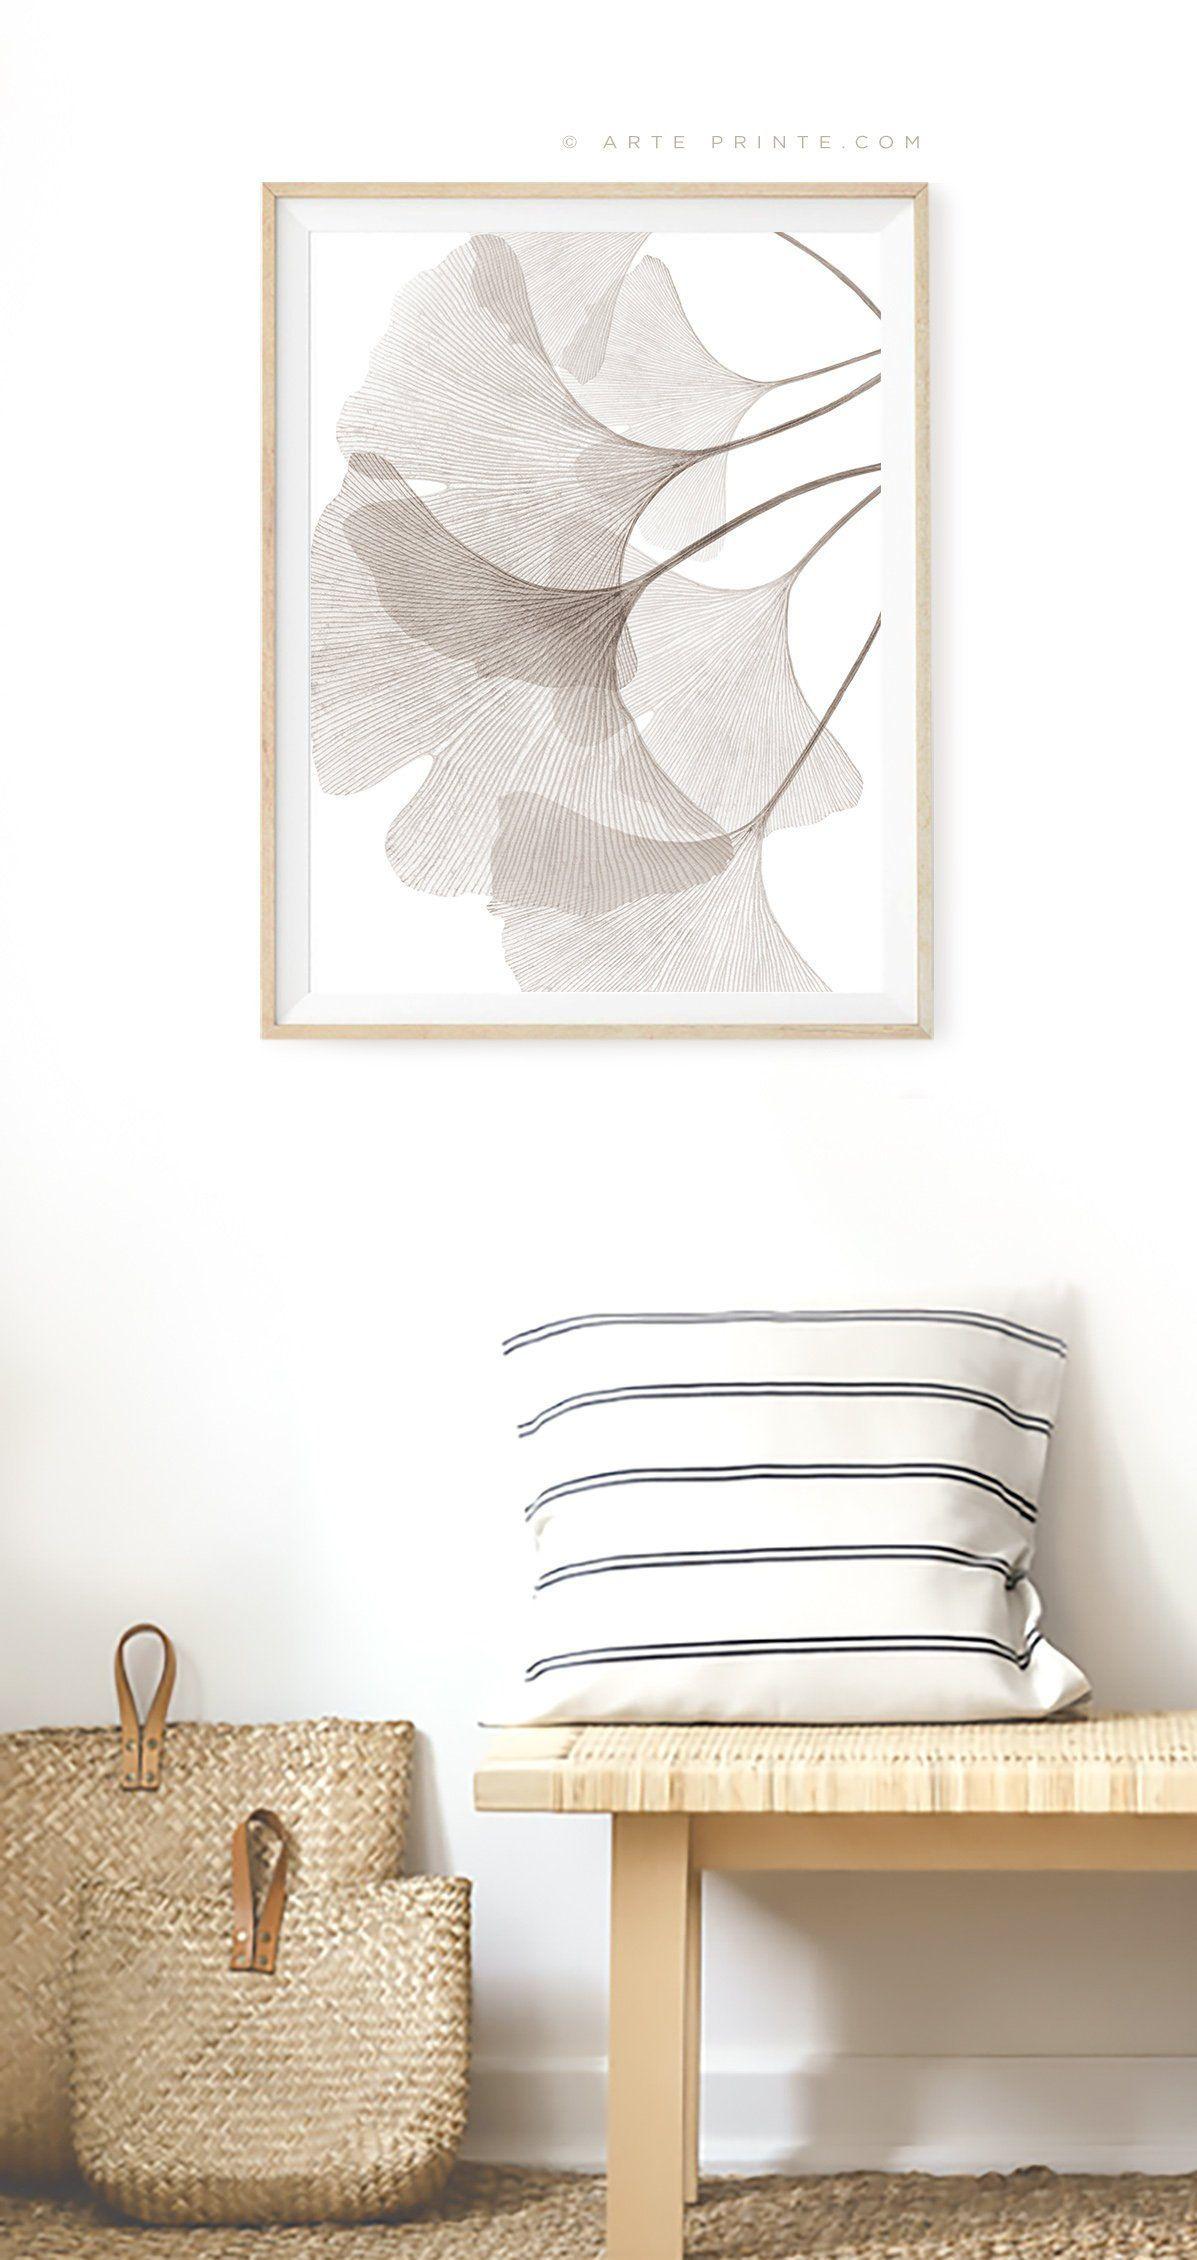 Ginkgo Leaf Print Brown Taupe Wall Art Modern Botanical Print Transparent Ginko Leaves Printable Poster Bedroom Wall Decor Digital Download In 2020 Wall Decor Bedroom Taupe Walls Home Decor Wall Art